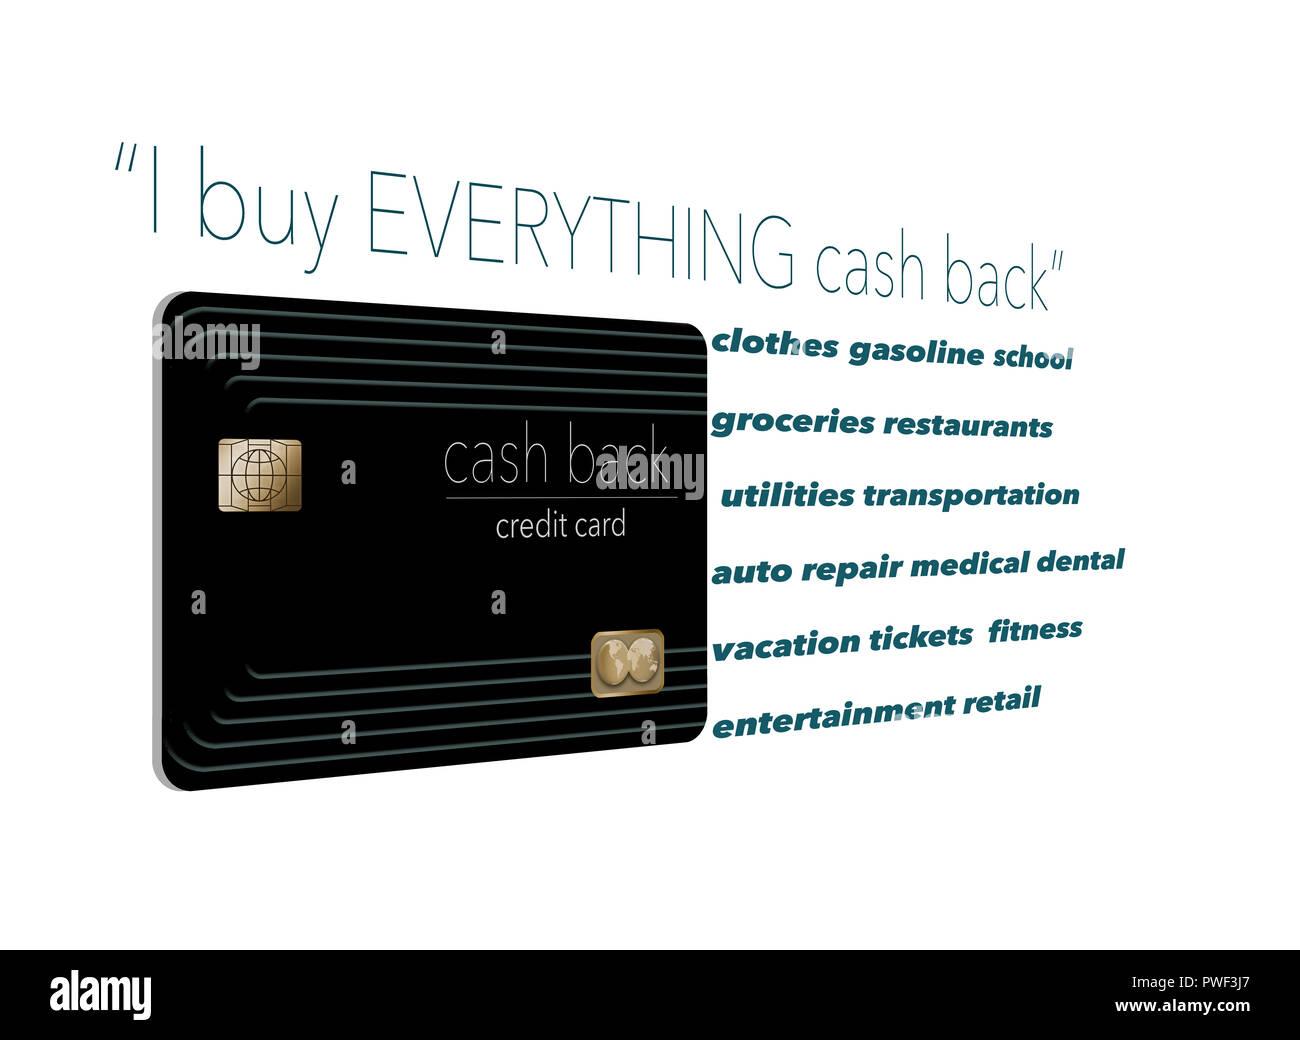 Cash back pw скидки на услуги